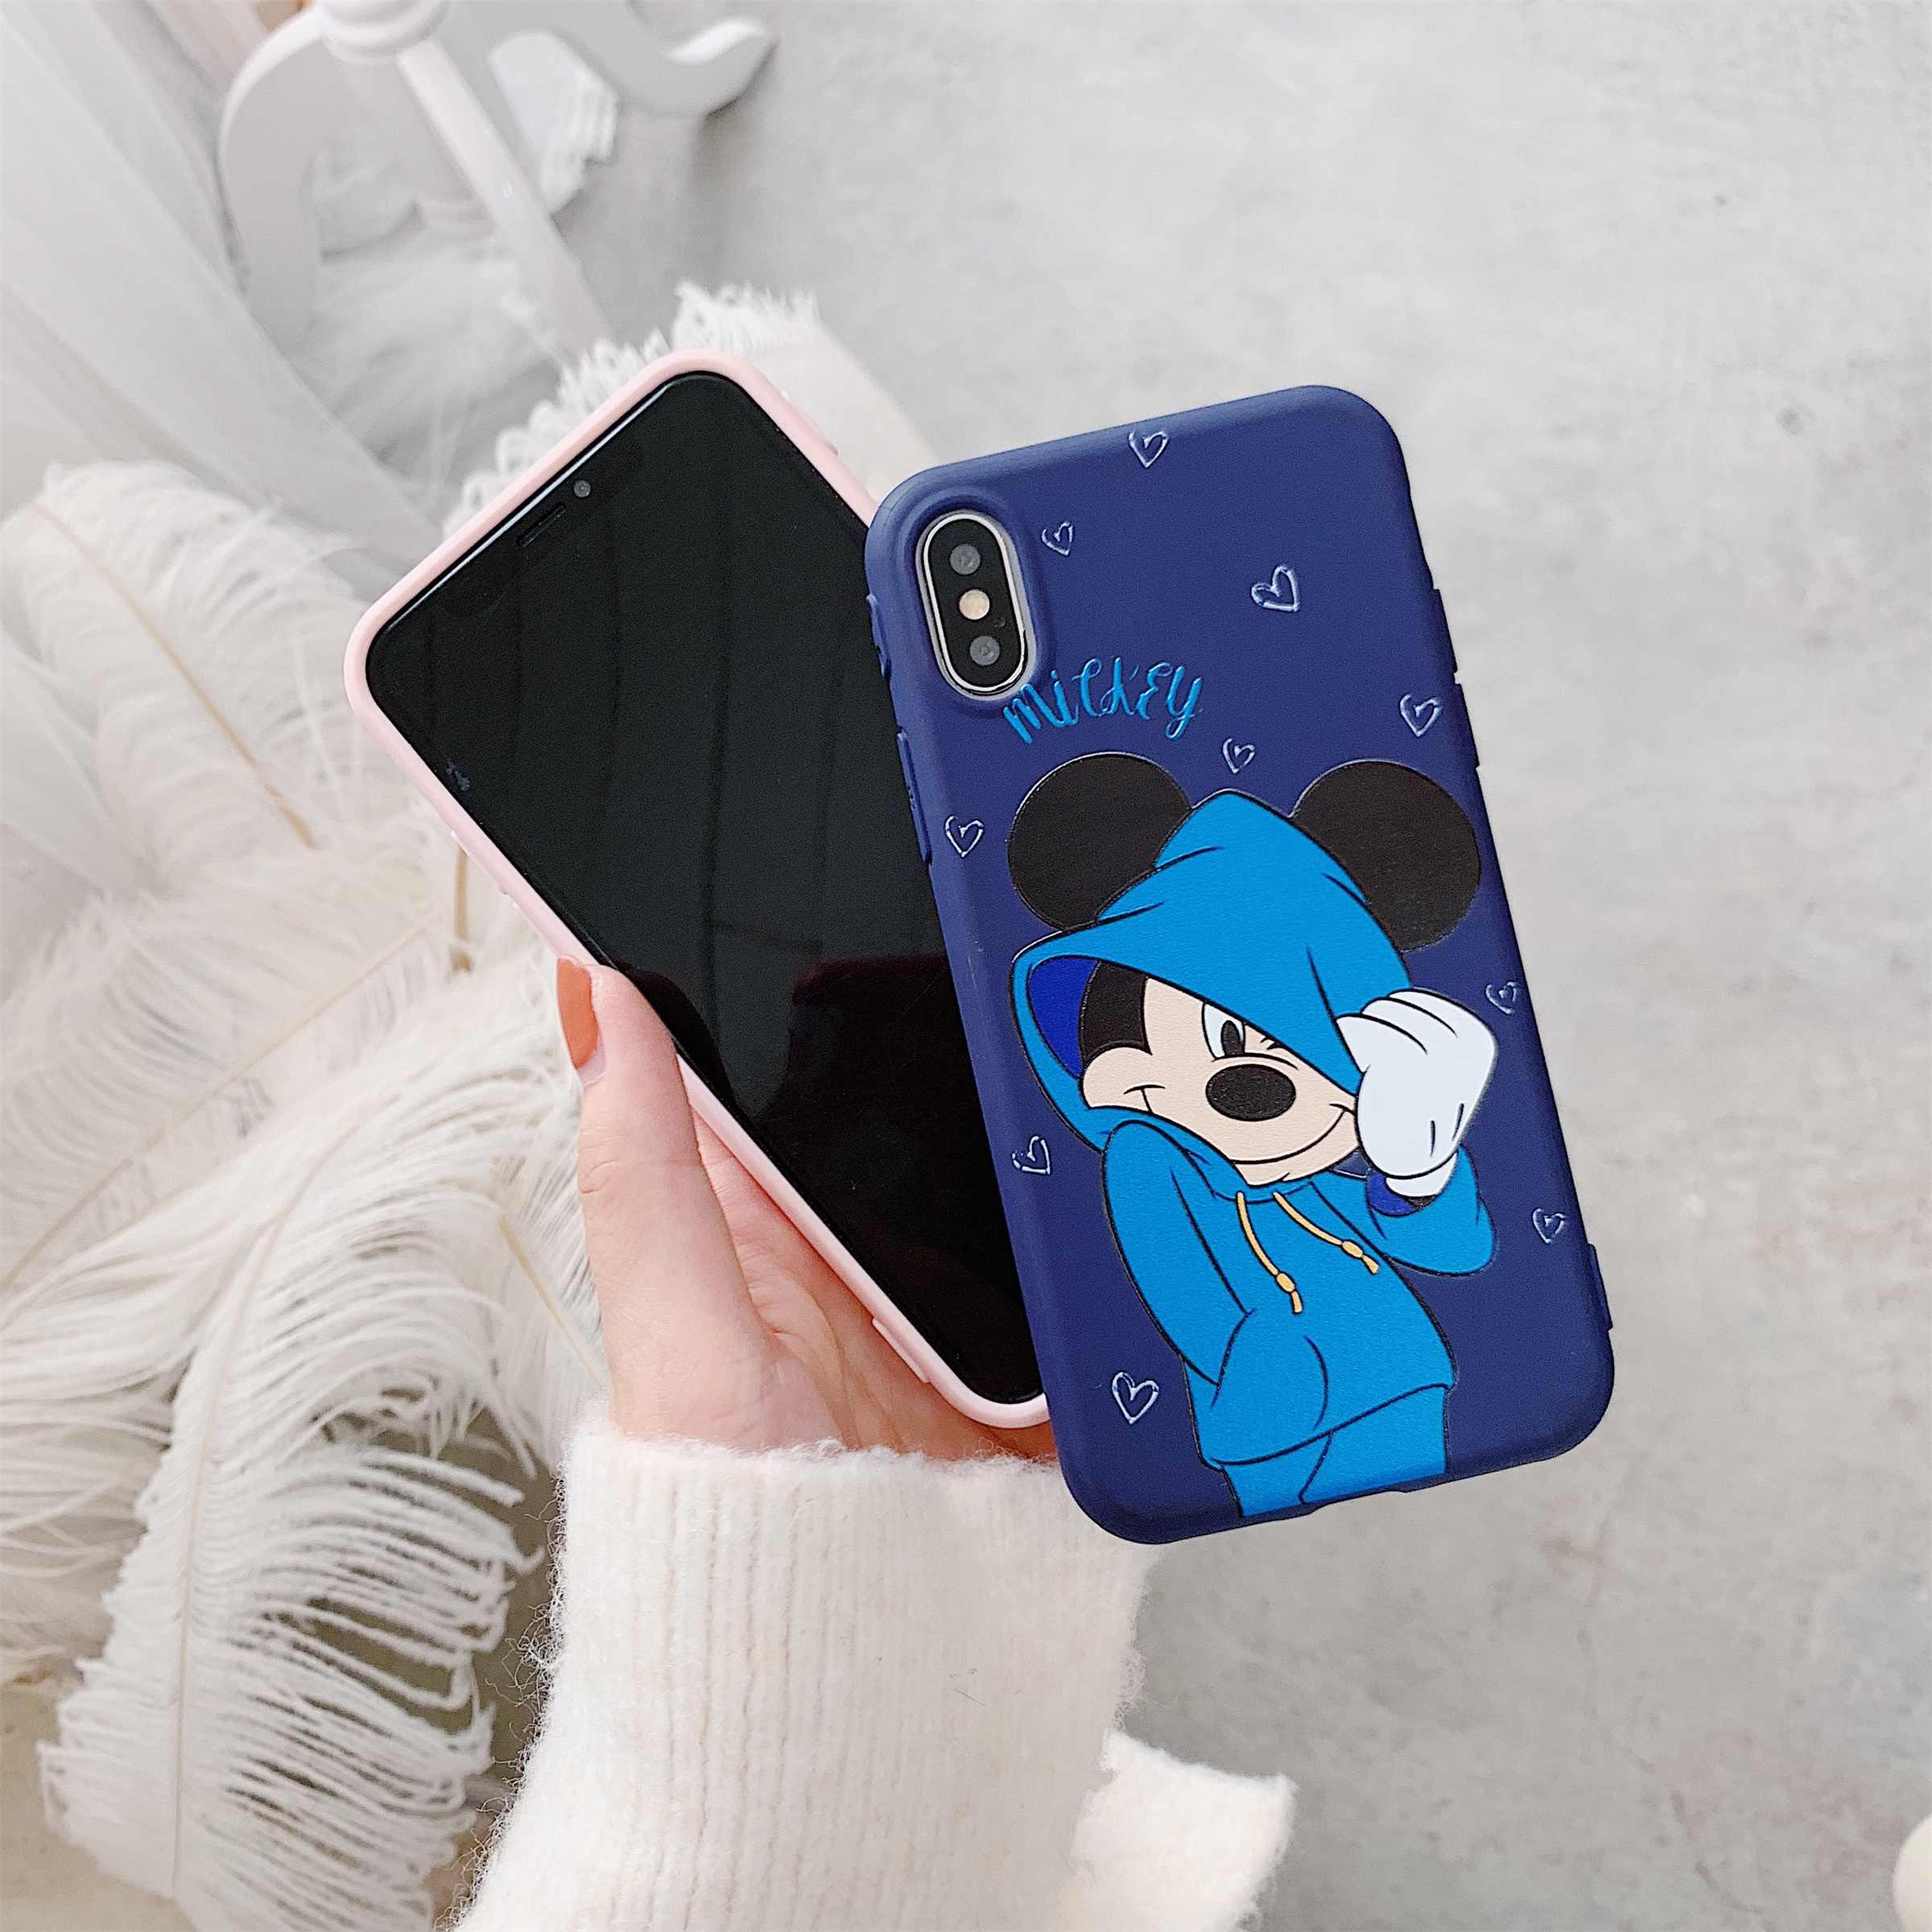 Para iphone X XR XS MAX cubierta para iphone XI 8C 11 6S 6 7 8 Plus marca tendencia funda para teléfono móvil con diseño de TPU Mickey Minnie